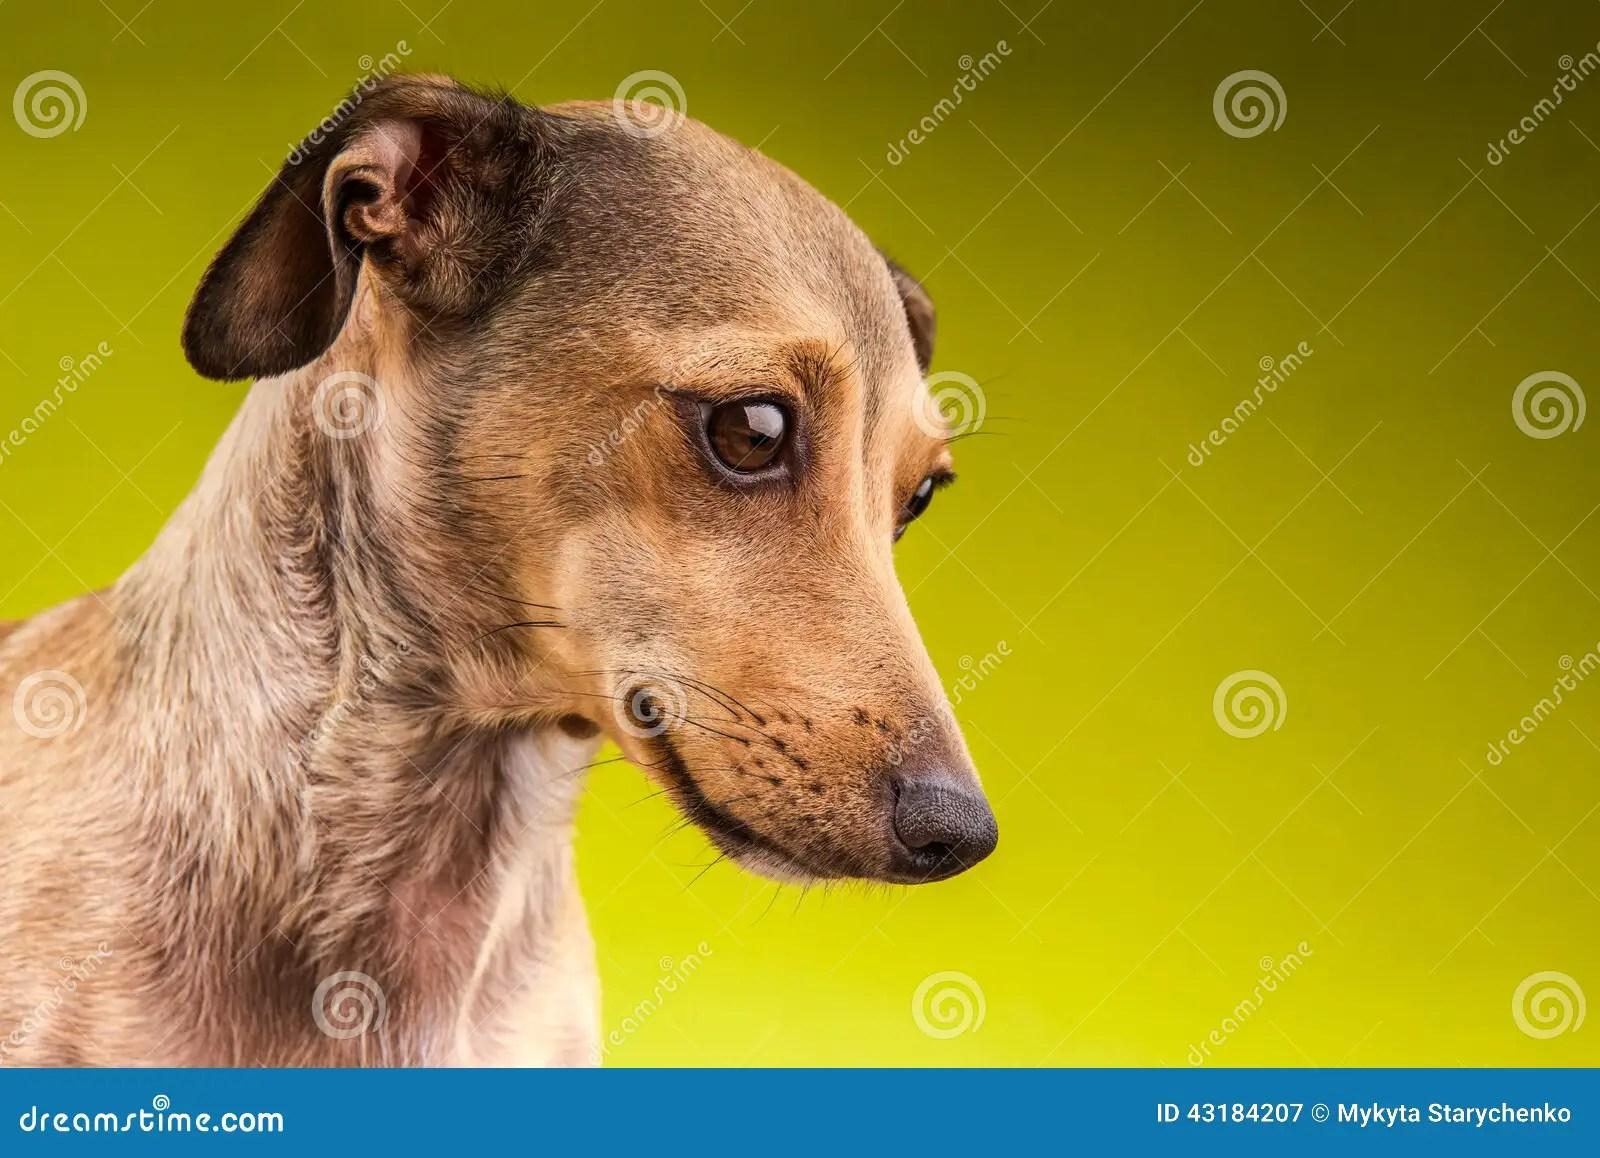 Cute Paw Print Wallpaper Small Brown Short Hair Dachshund Dog Stock Image Image